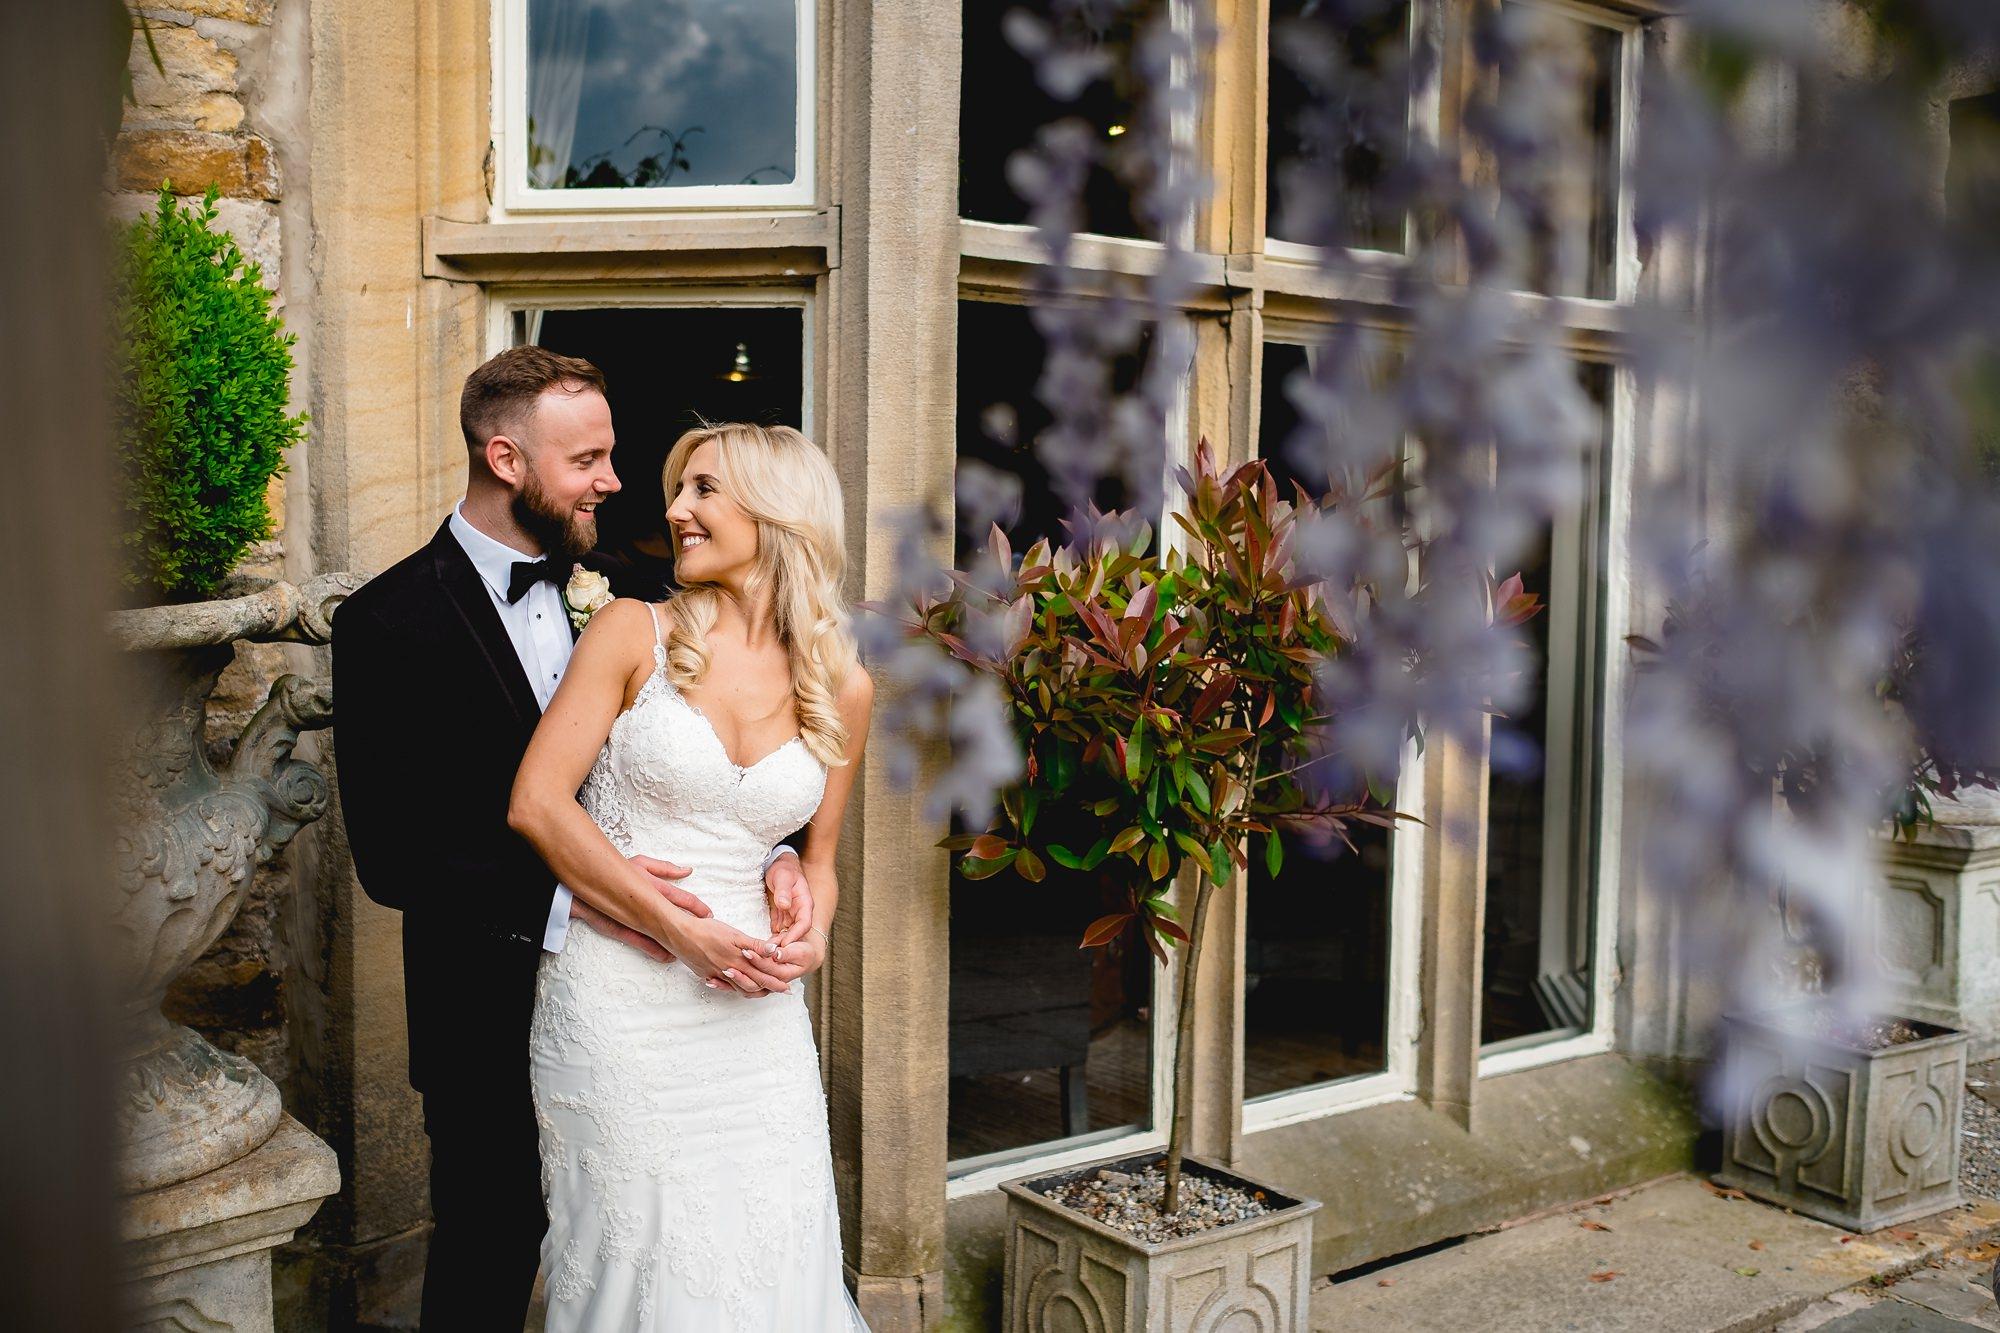 Mitton-Hall-Wedding-Photographer_0022.jpg